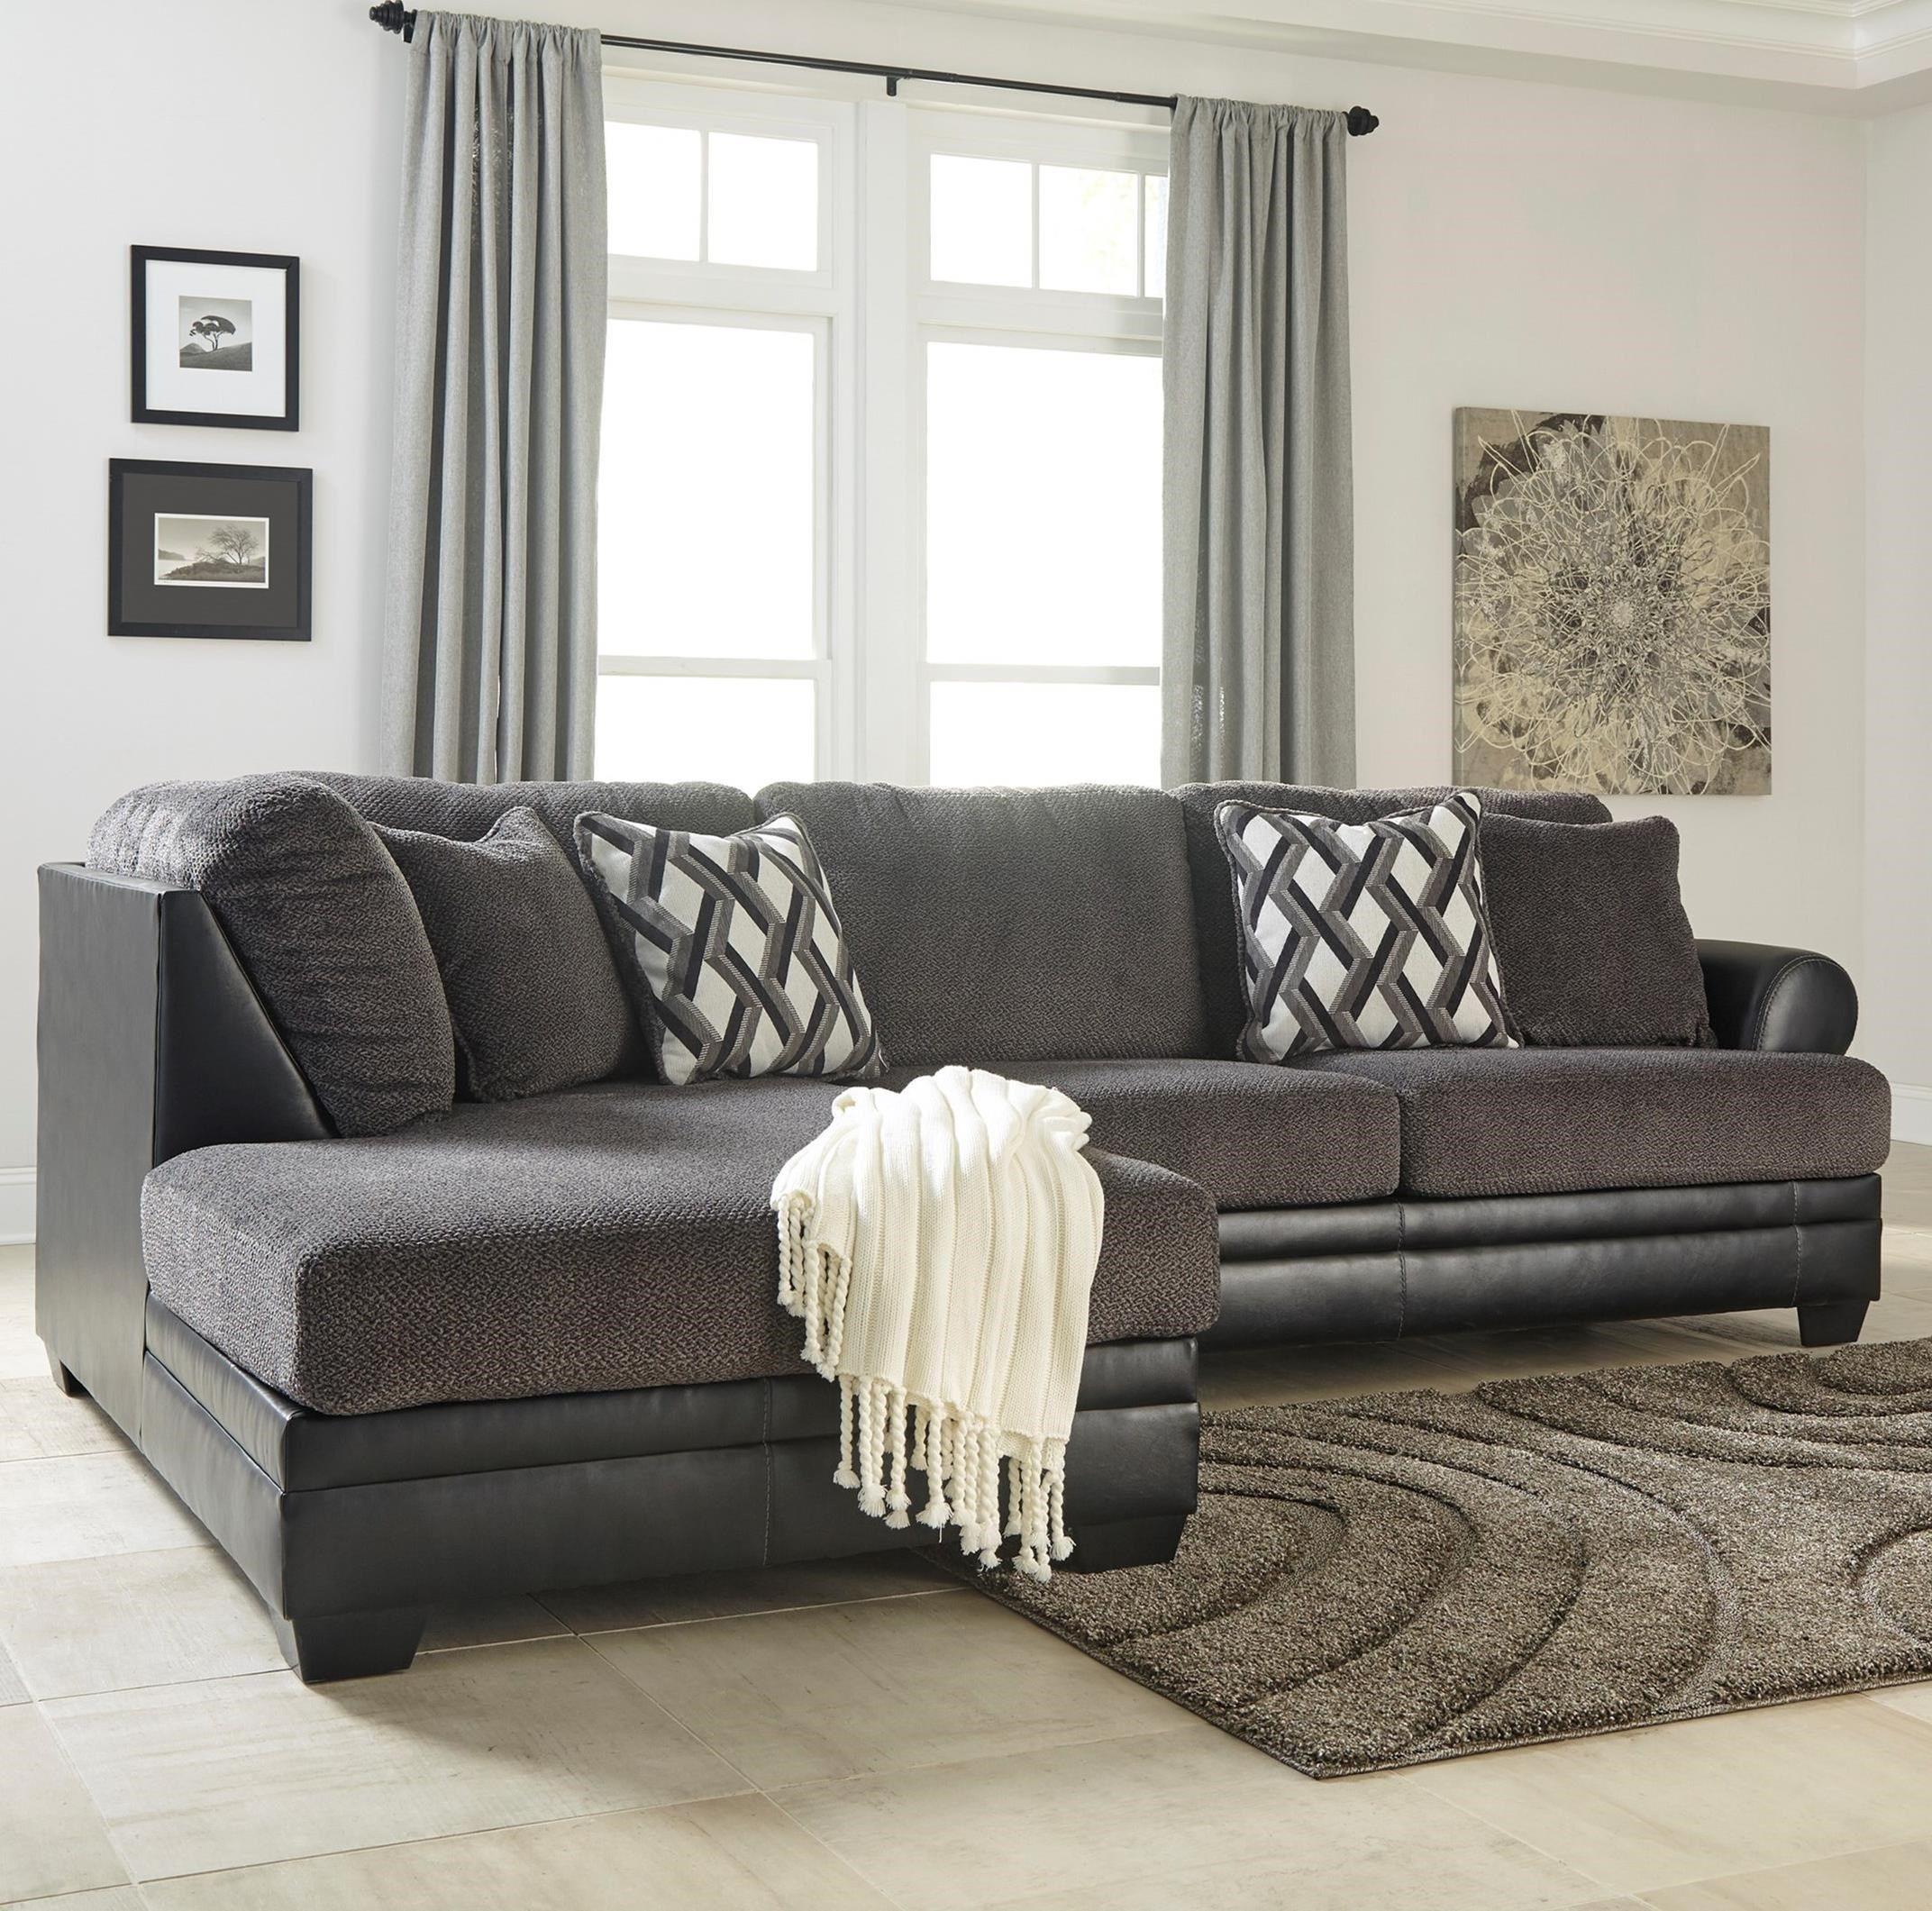 mmfurniture espresso cupboard benchcraft from sofa com by buy breville furniture set